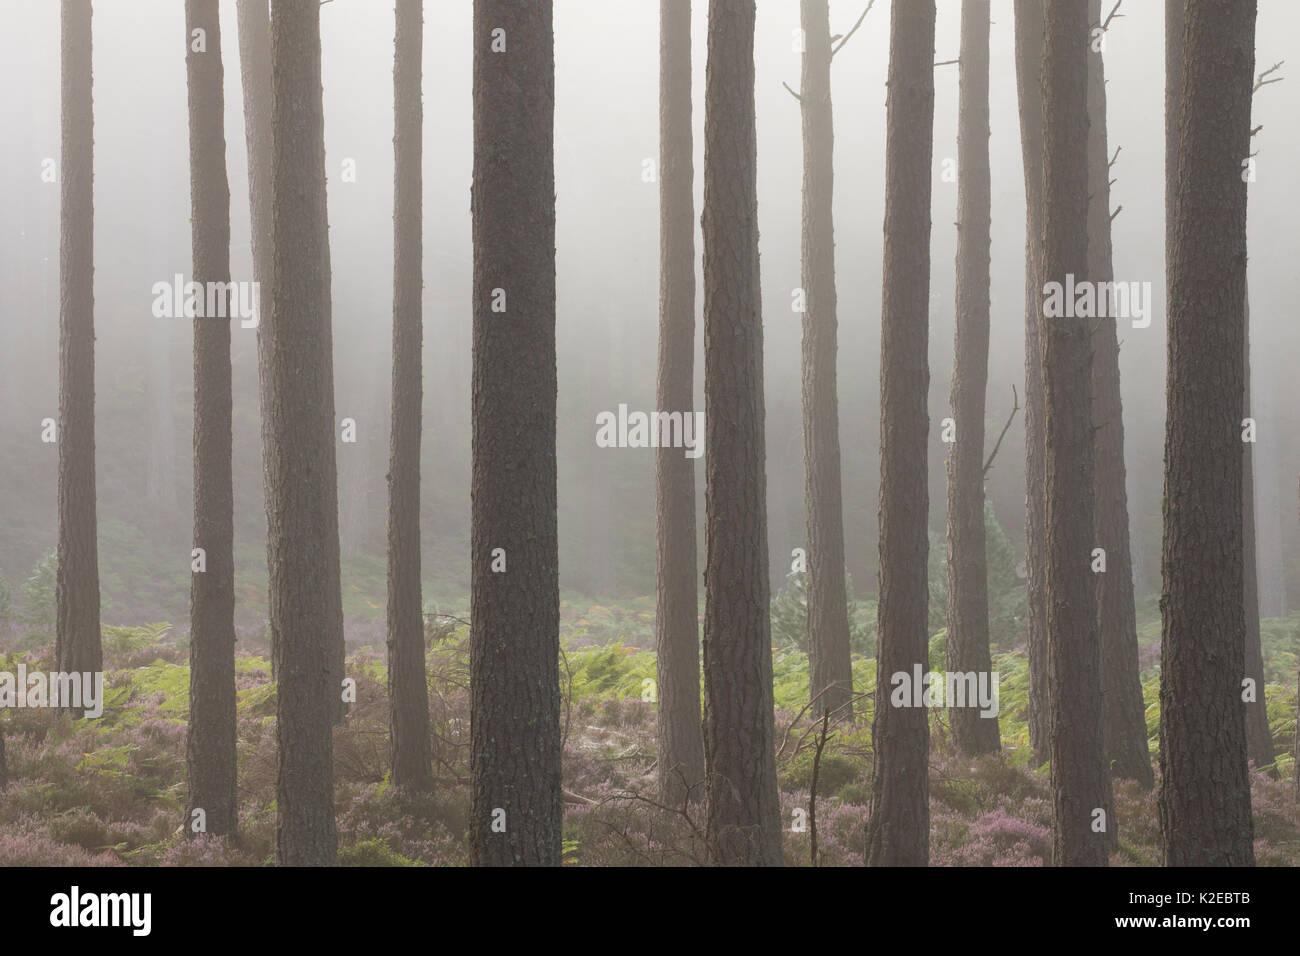 Scots pine (Pinus sylvestris )tree trunks in dawn mist, Rothiemurchus, Cairngorms National Park, Scotland, UK, August. - Stock Image